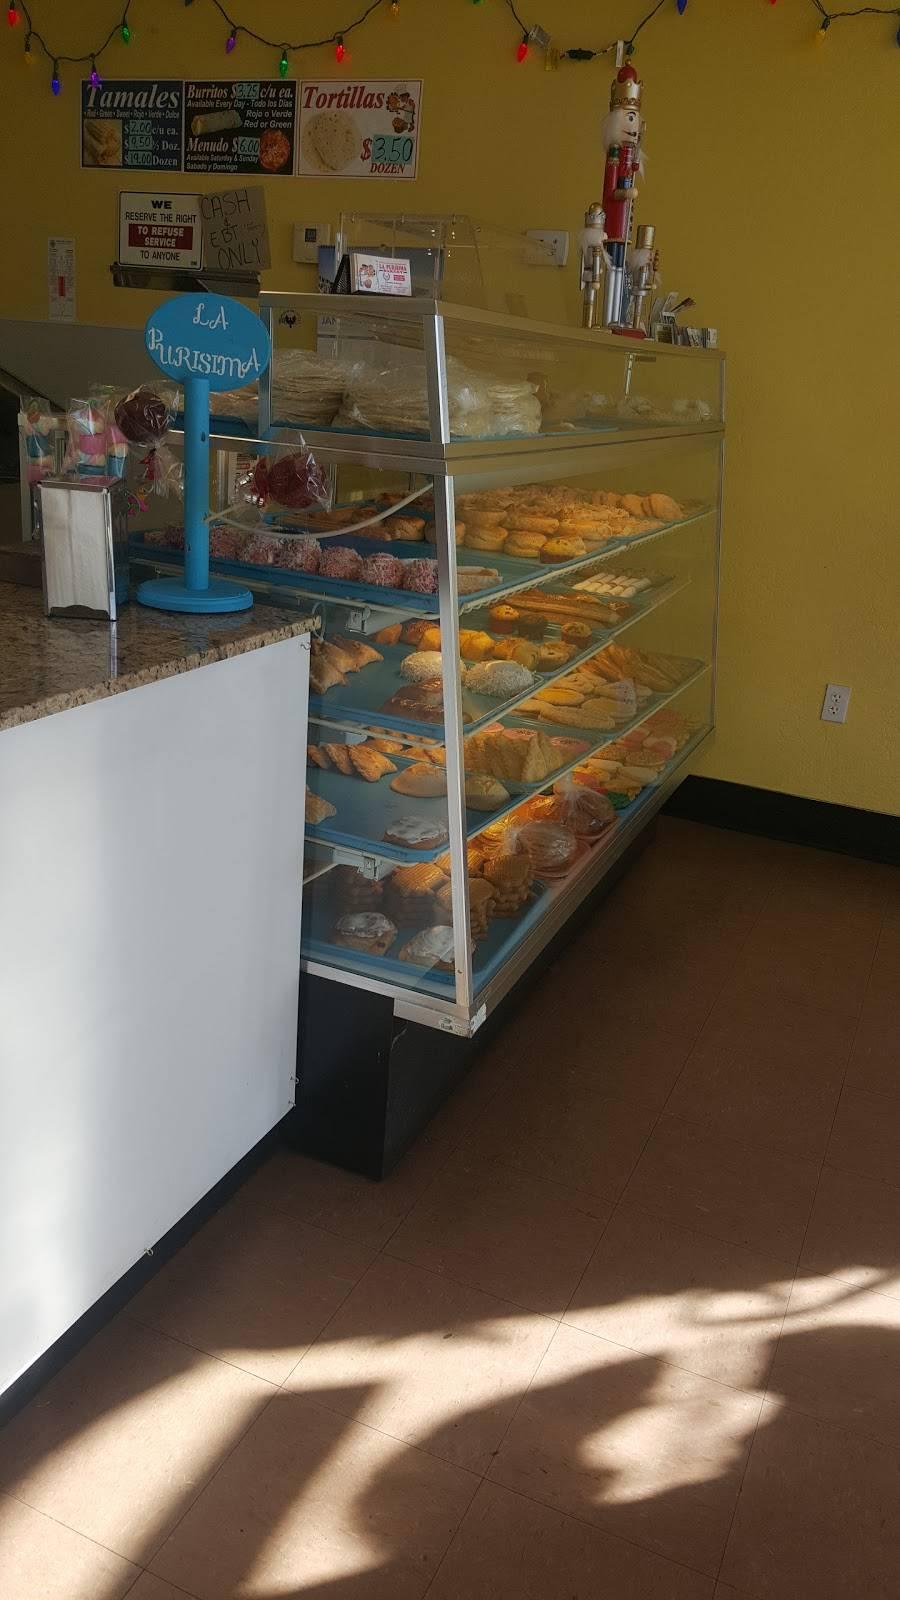 La Purisima Bakery 2 - bakery  | Photo 4 of 5 | Address: 2318 E Indian School Rd, Phoenix, AZ 85016, USA | Phone: (602) 957-2771